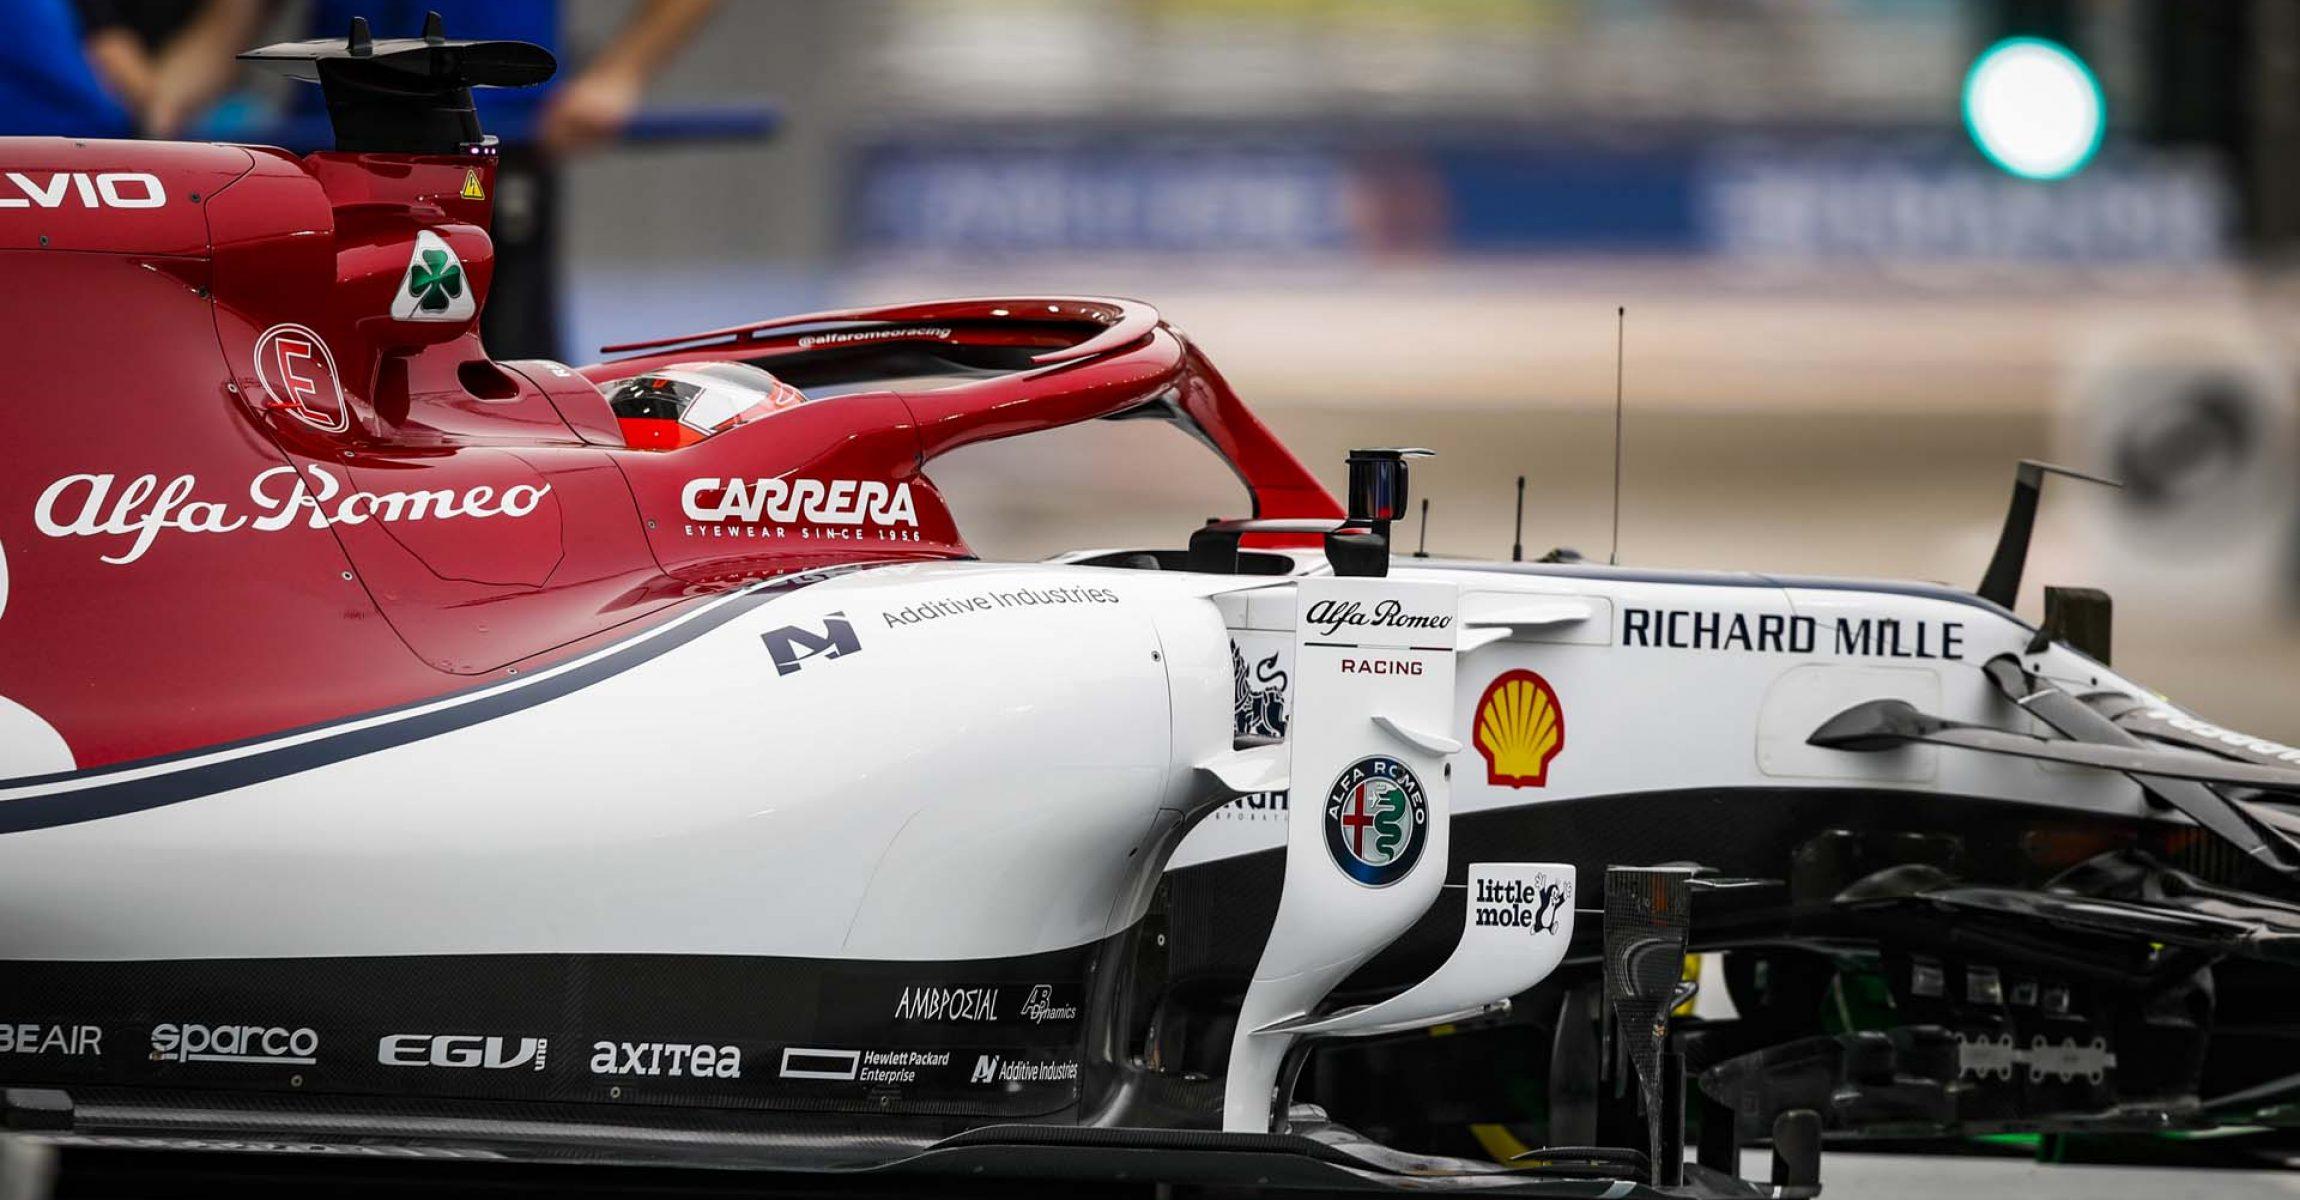 RAIKKONEN Kimi Räikkönen (fin), Alfa Romeo Racing C38, action during the 2019 Formula One World Championship, Singapore Grand Prix from September 19 to 22 in Singapour - Photo Florent Gooden / DPPI